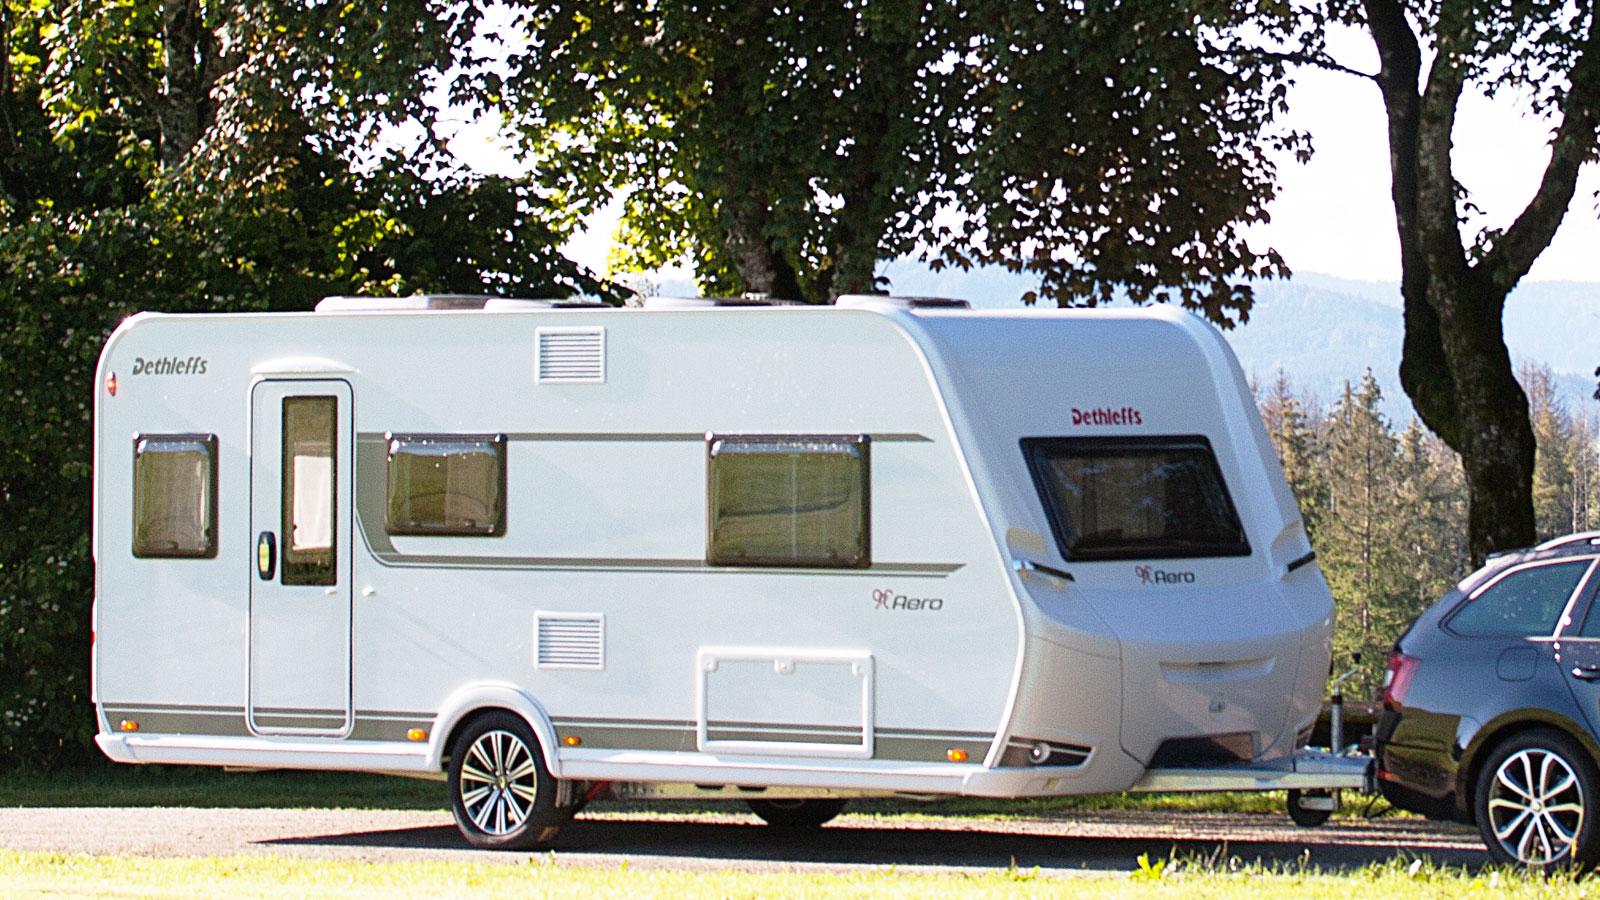 Dethleffs Aero (2021) - Camping, Cars & Caravans